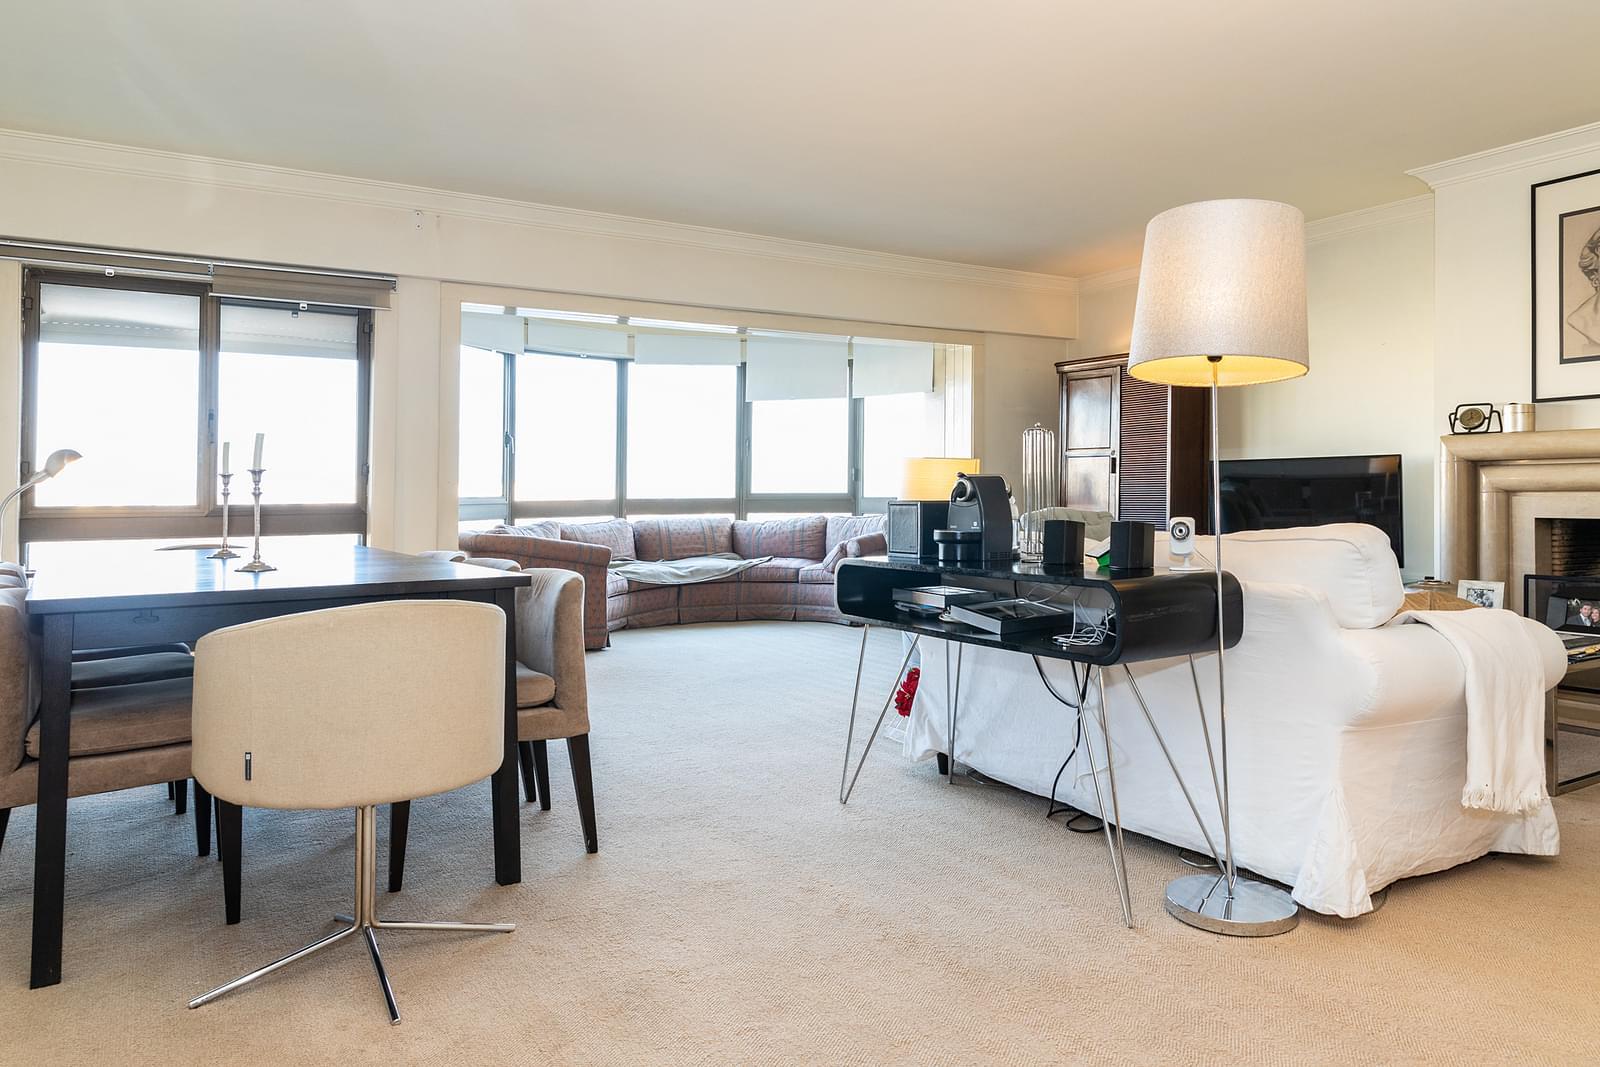 pf18210-apartamento-t4-lisboa-a4959080-7470-4c8c-9b29-16a0f8e91546